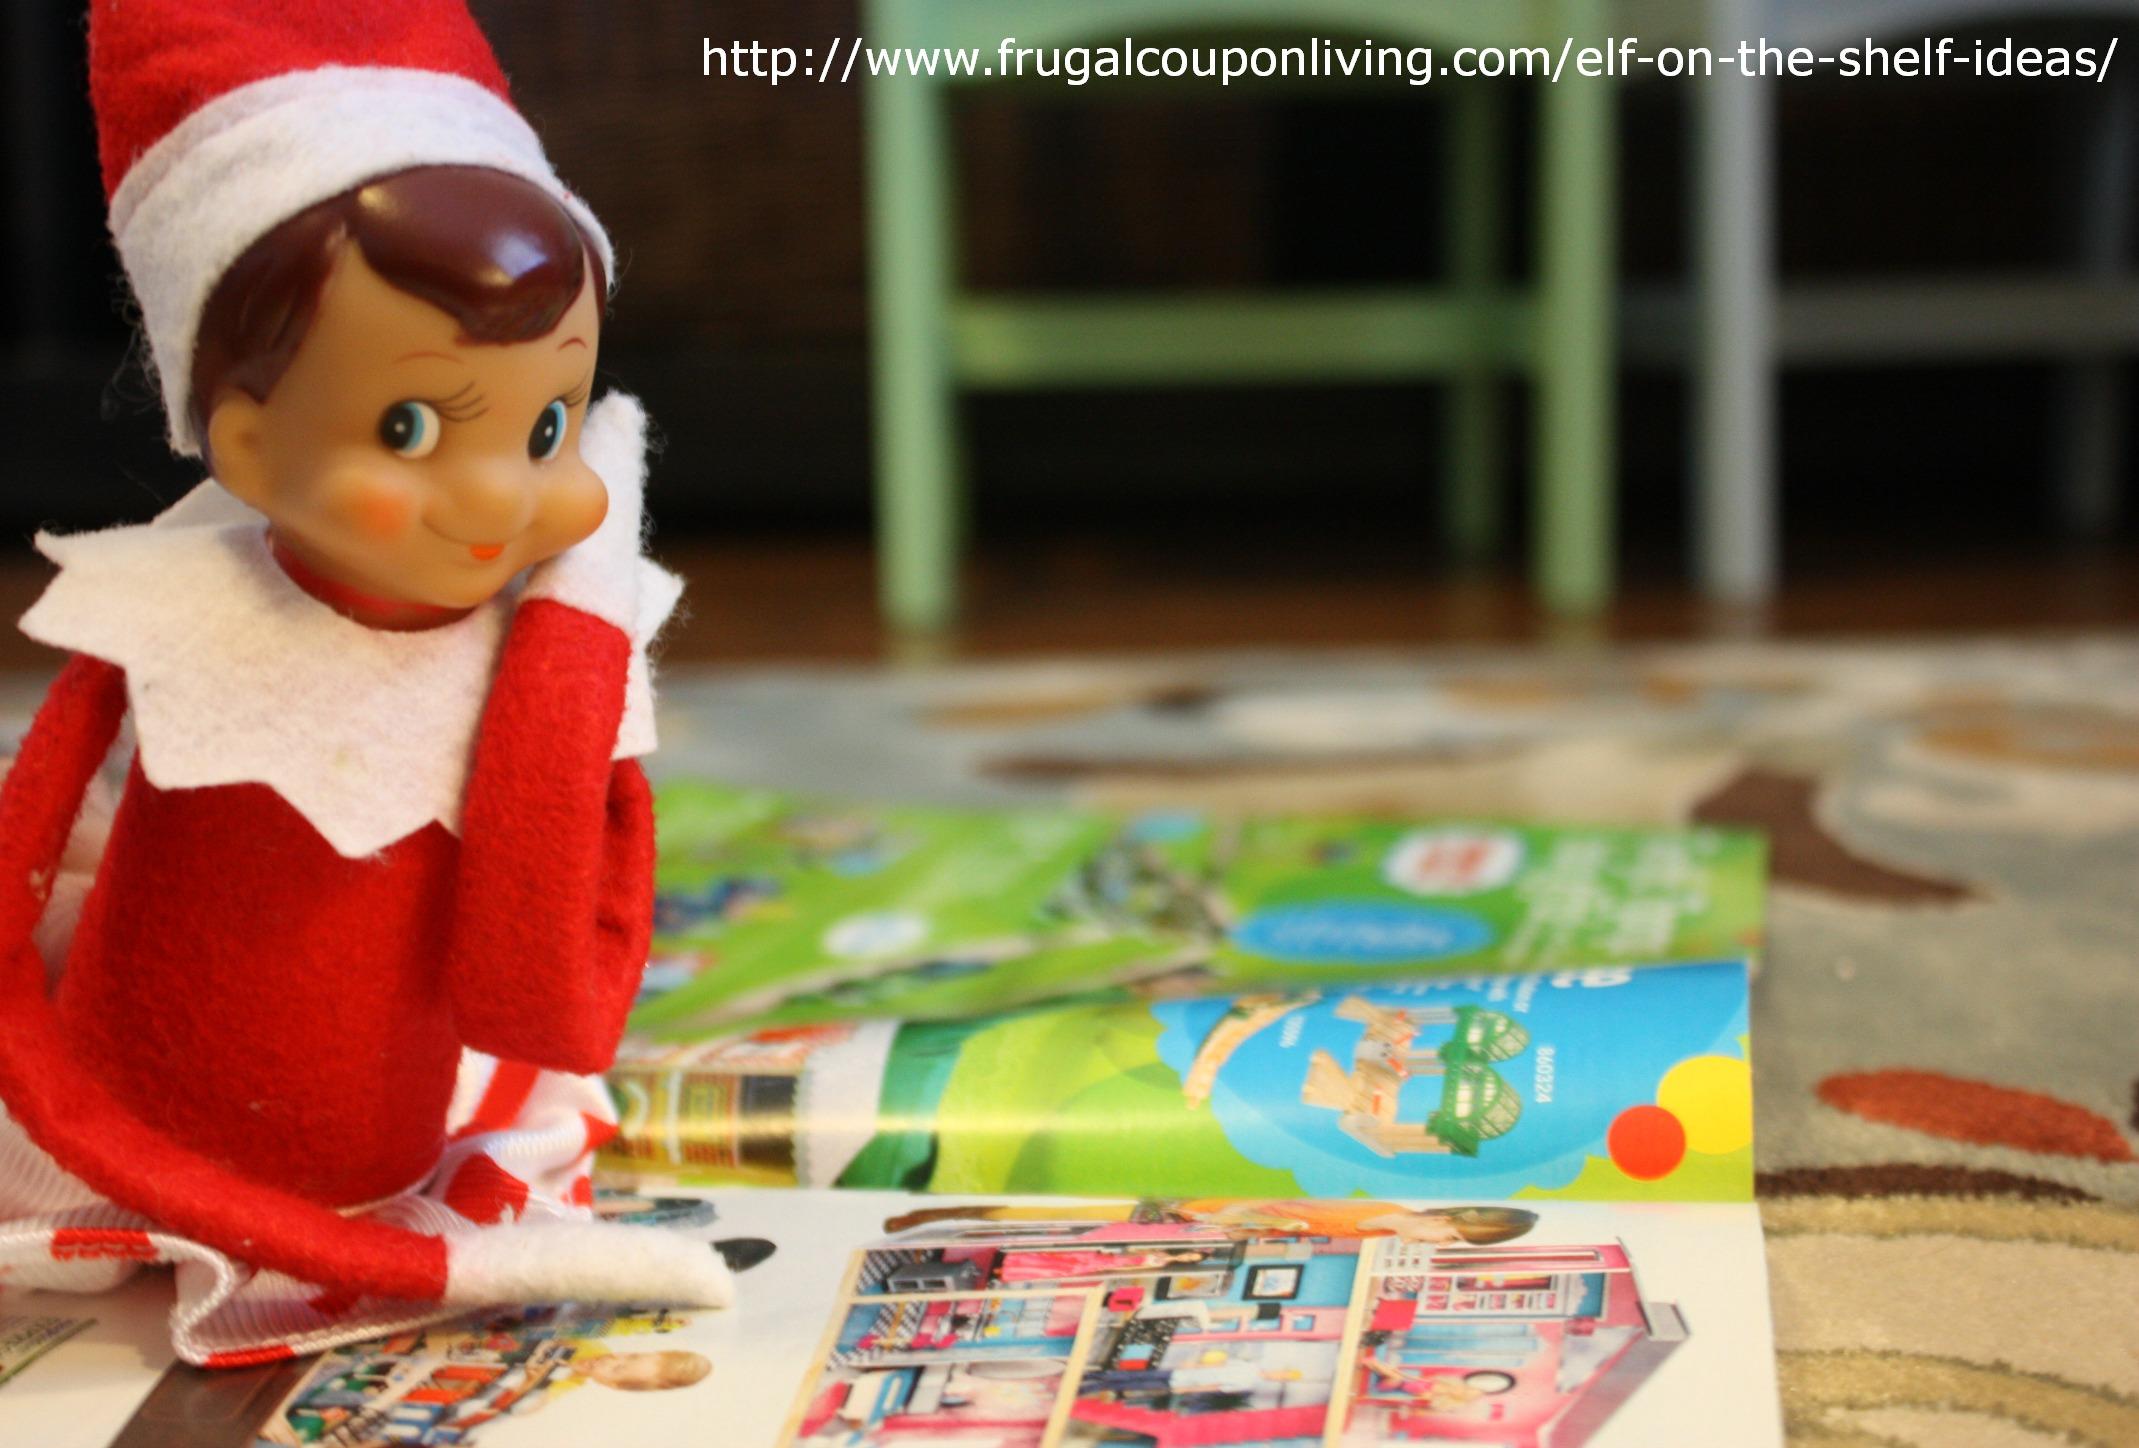 Elf coupons